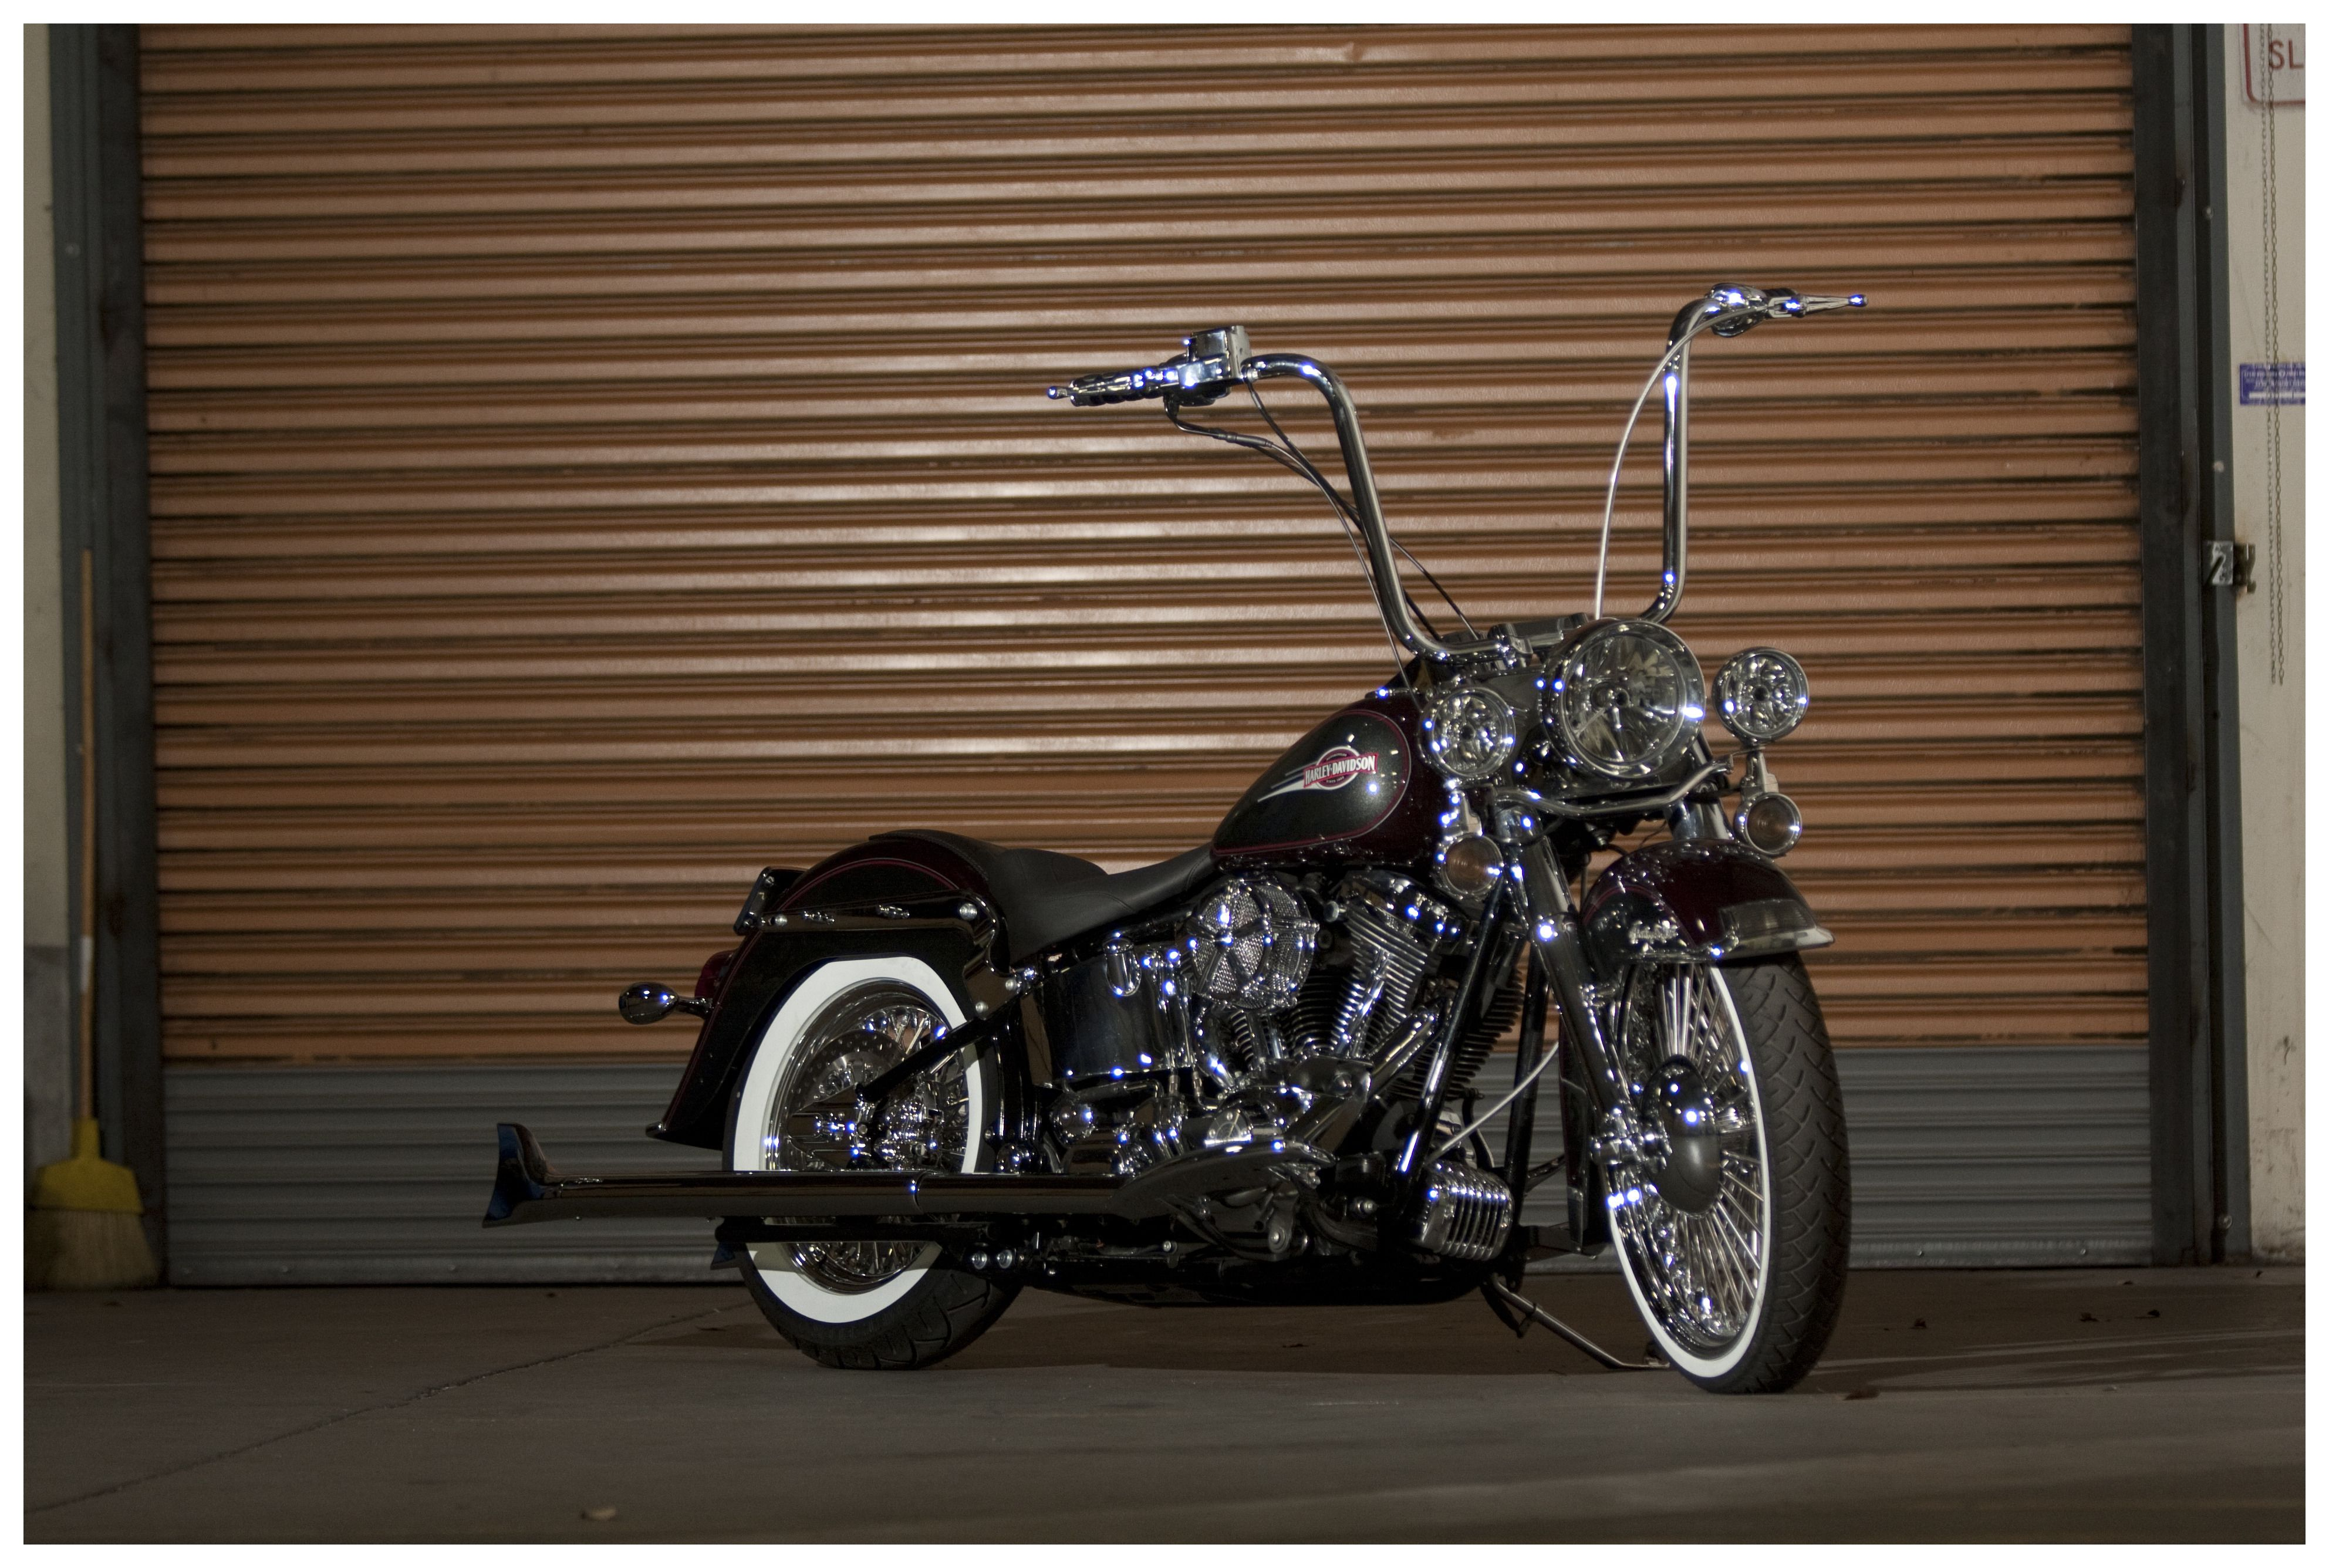 Burly Handlebar Cable Installation Kit For Harley Sportster 1997-2003